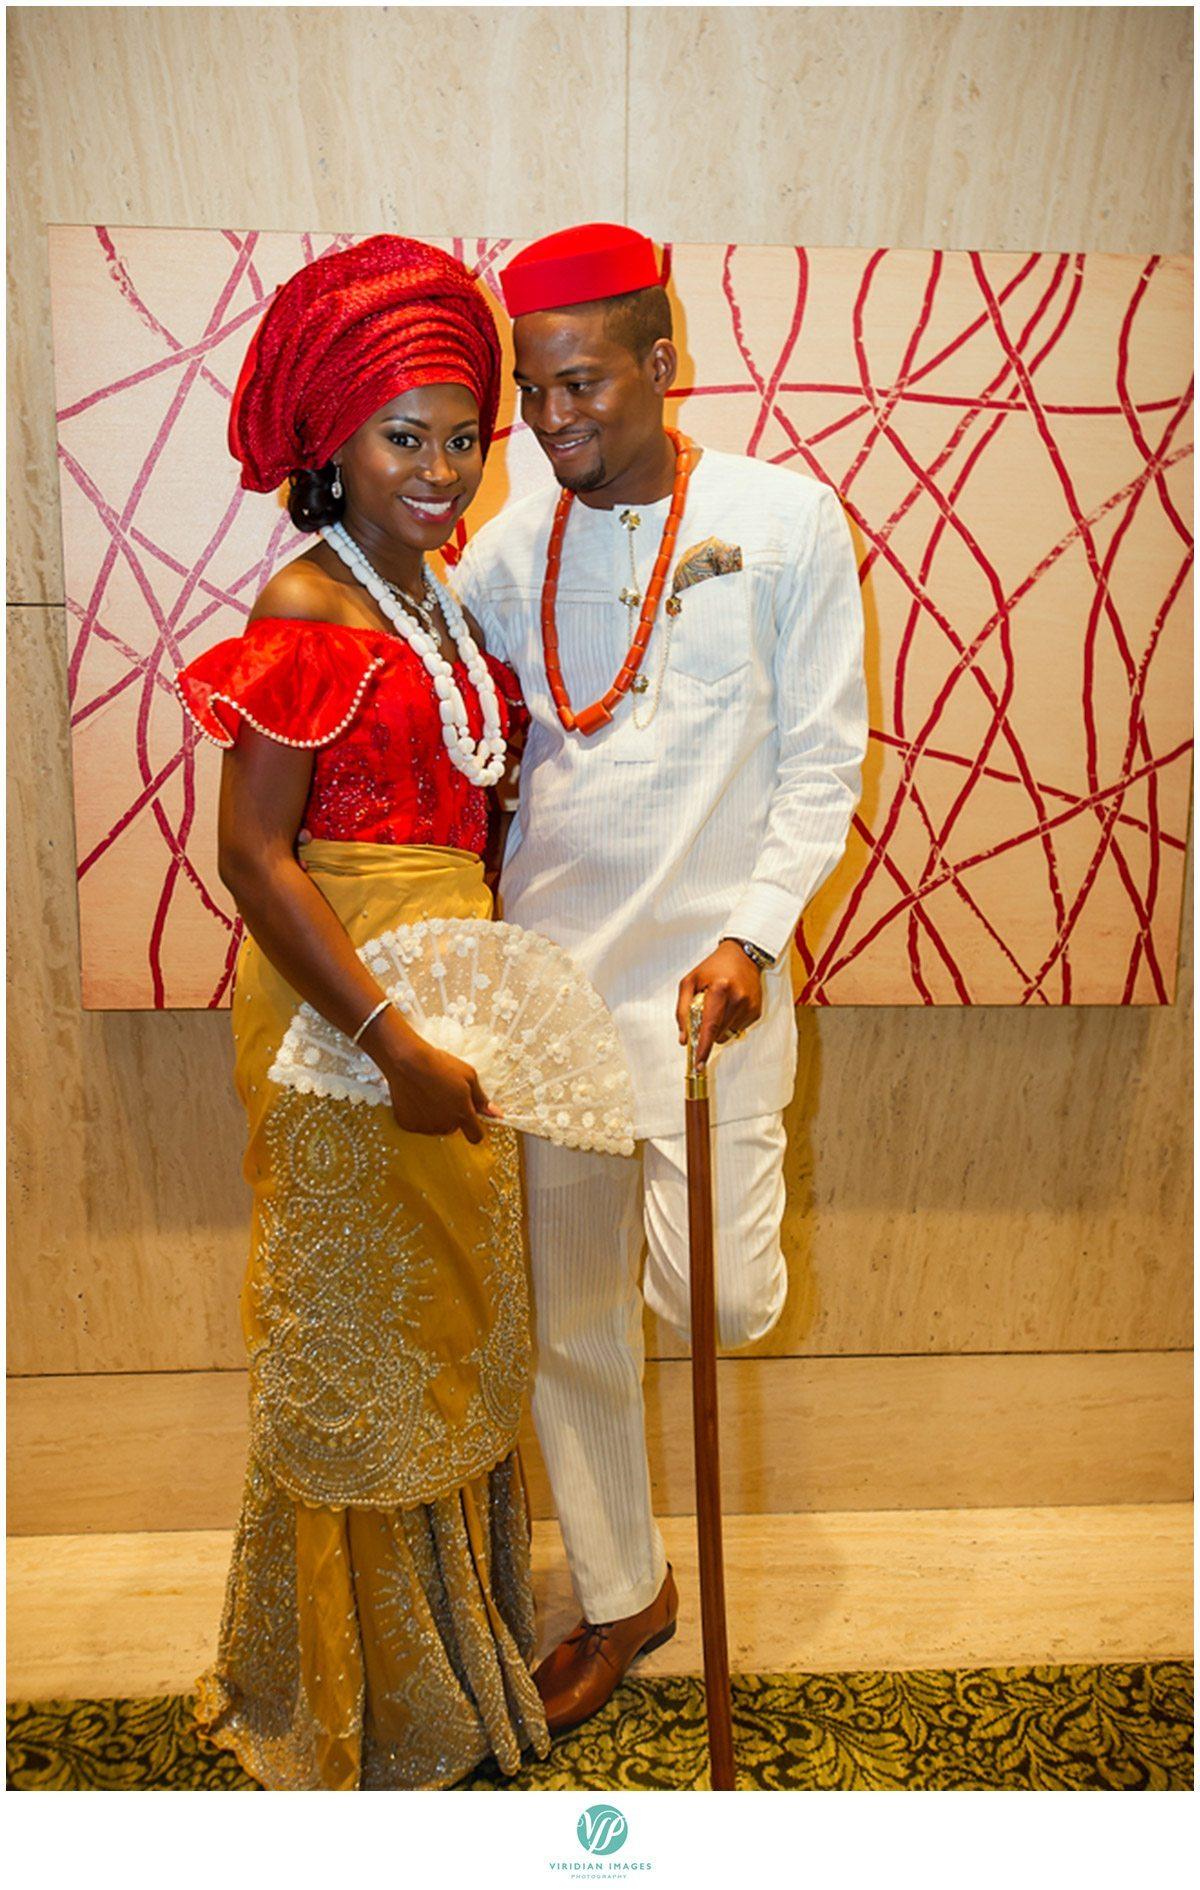 Renaissance Waerly Atlanta Wedding Nigerian Bride and Groom Photo